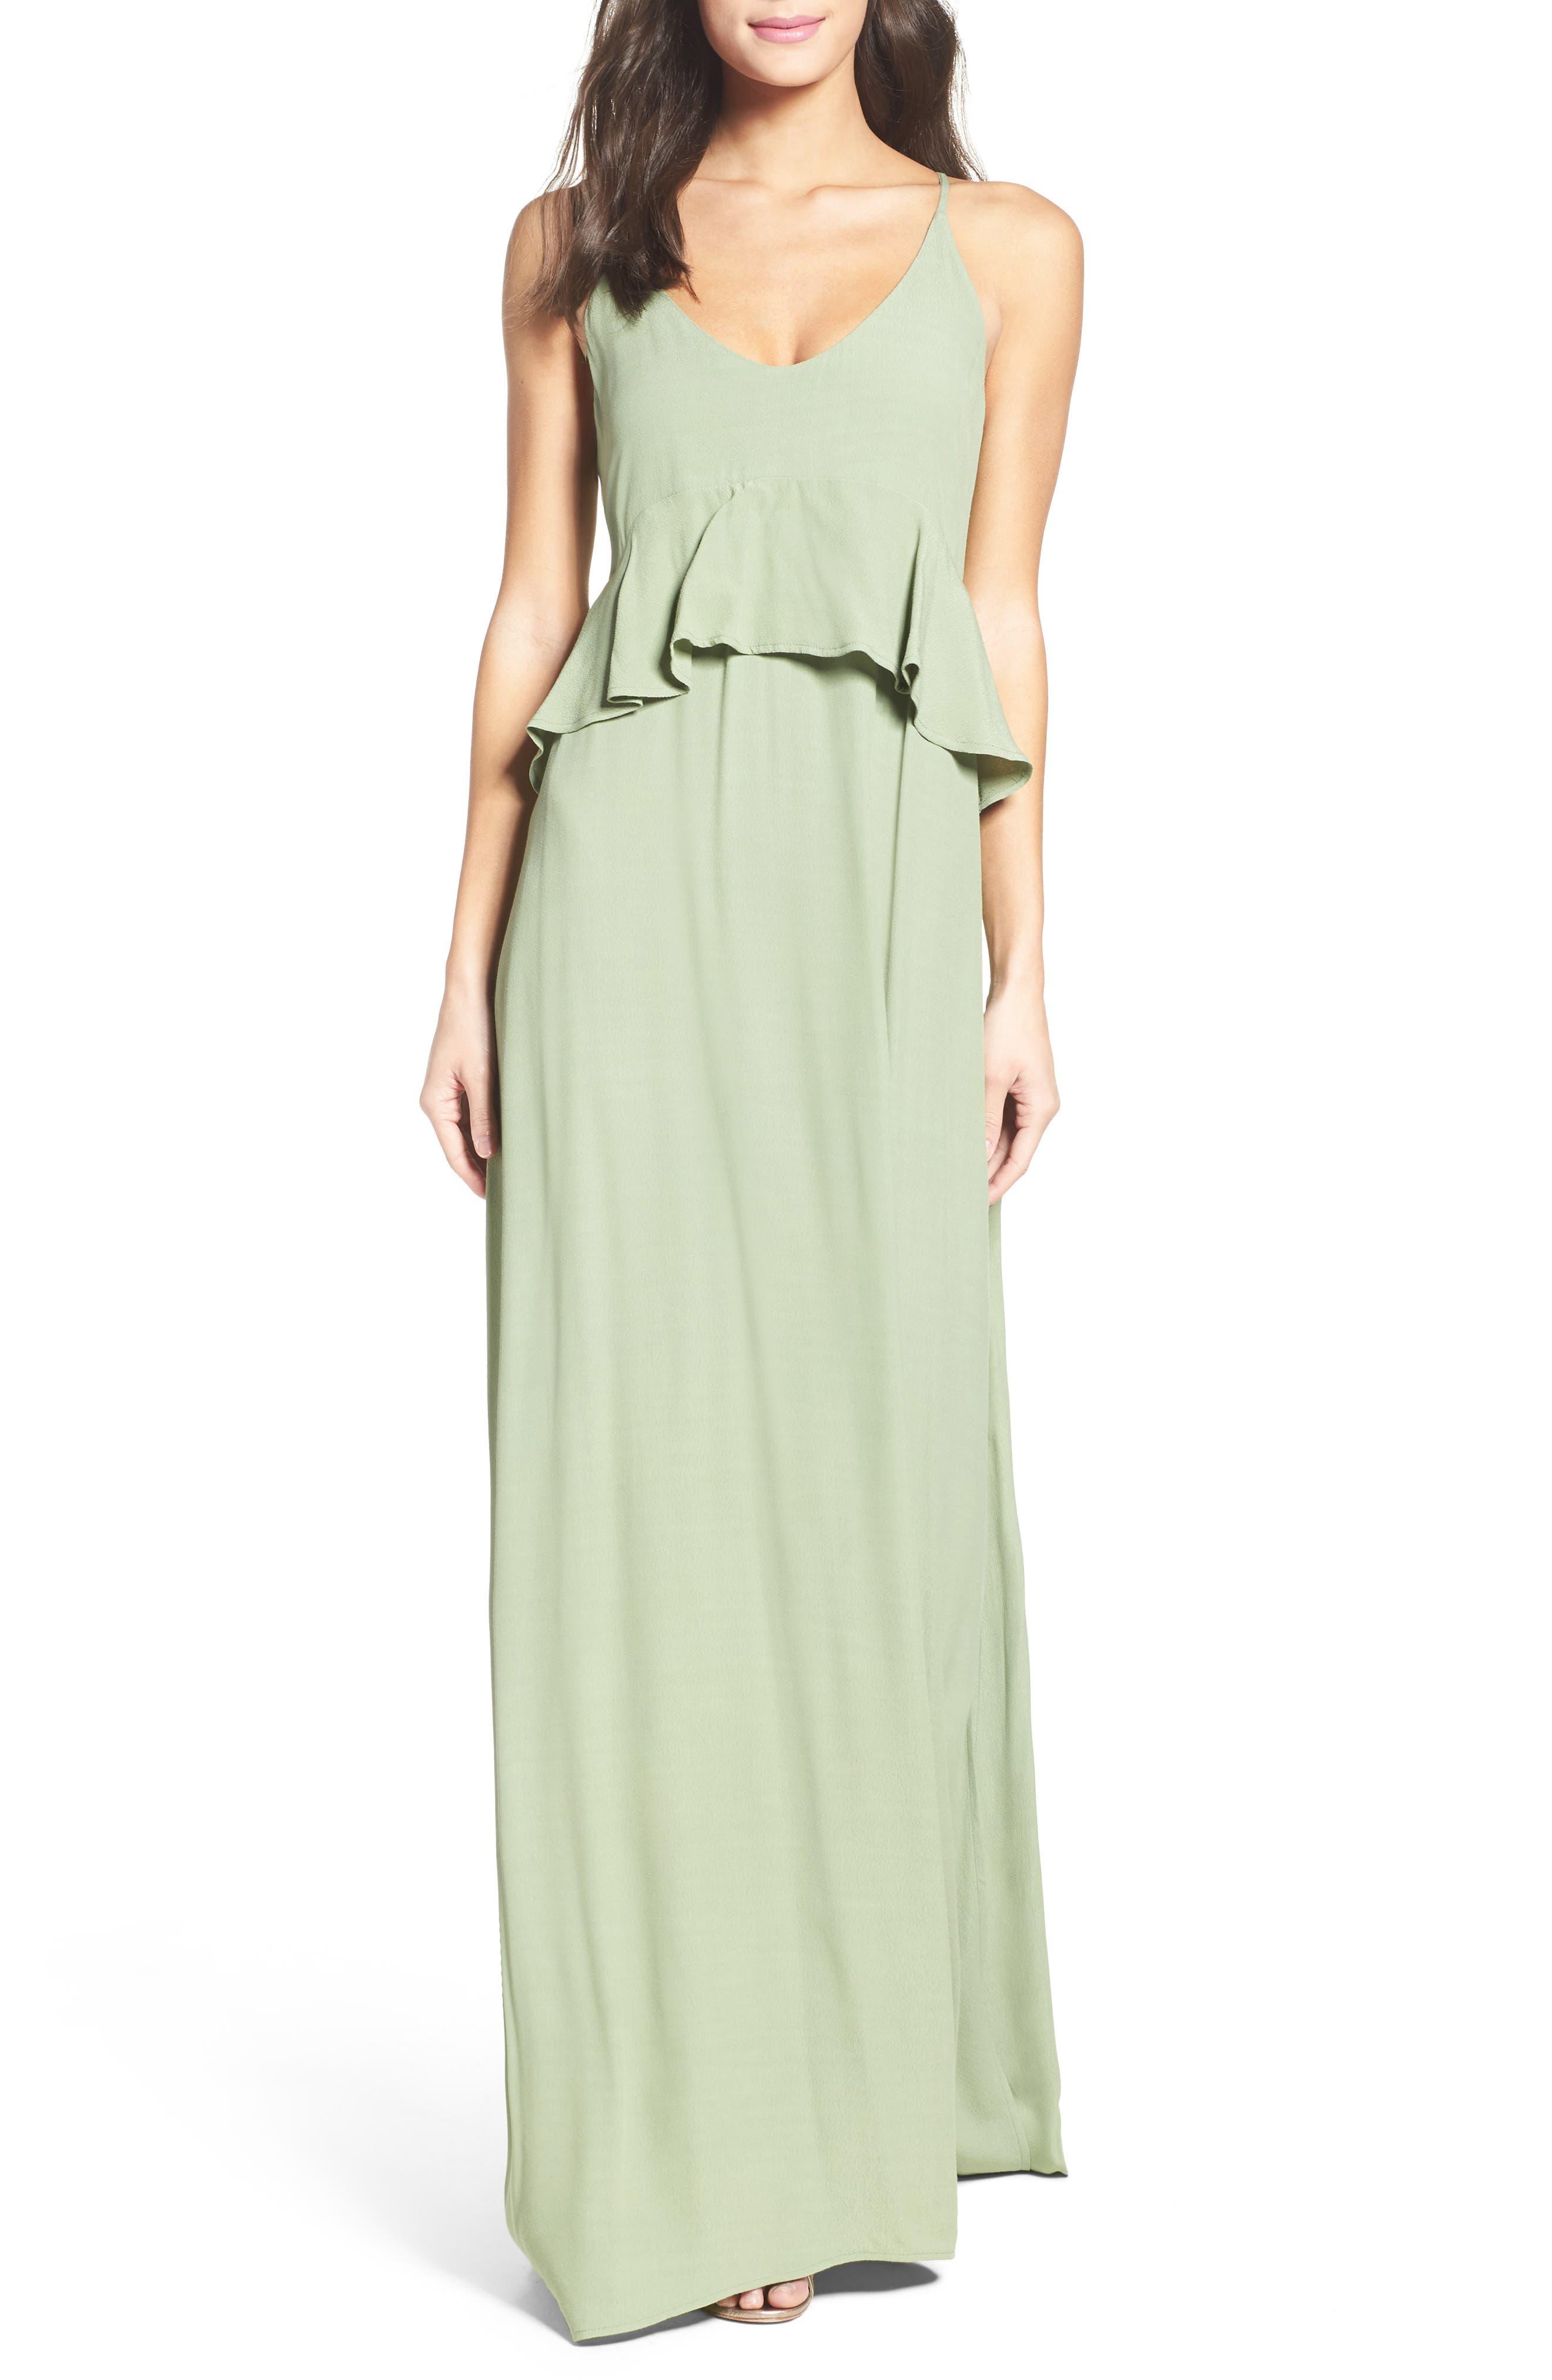 Roe + May Jolie Crepe Peplum Dress,                         Main,                         color,